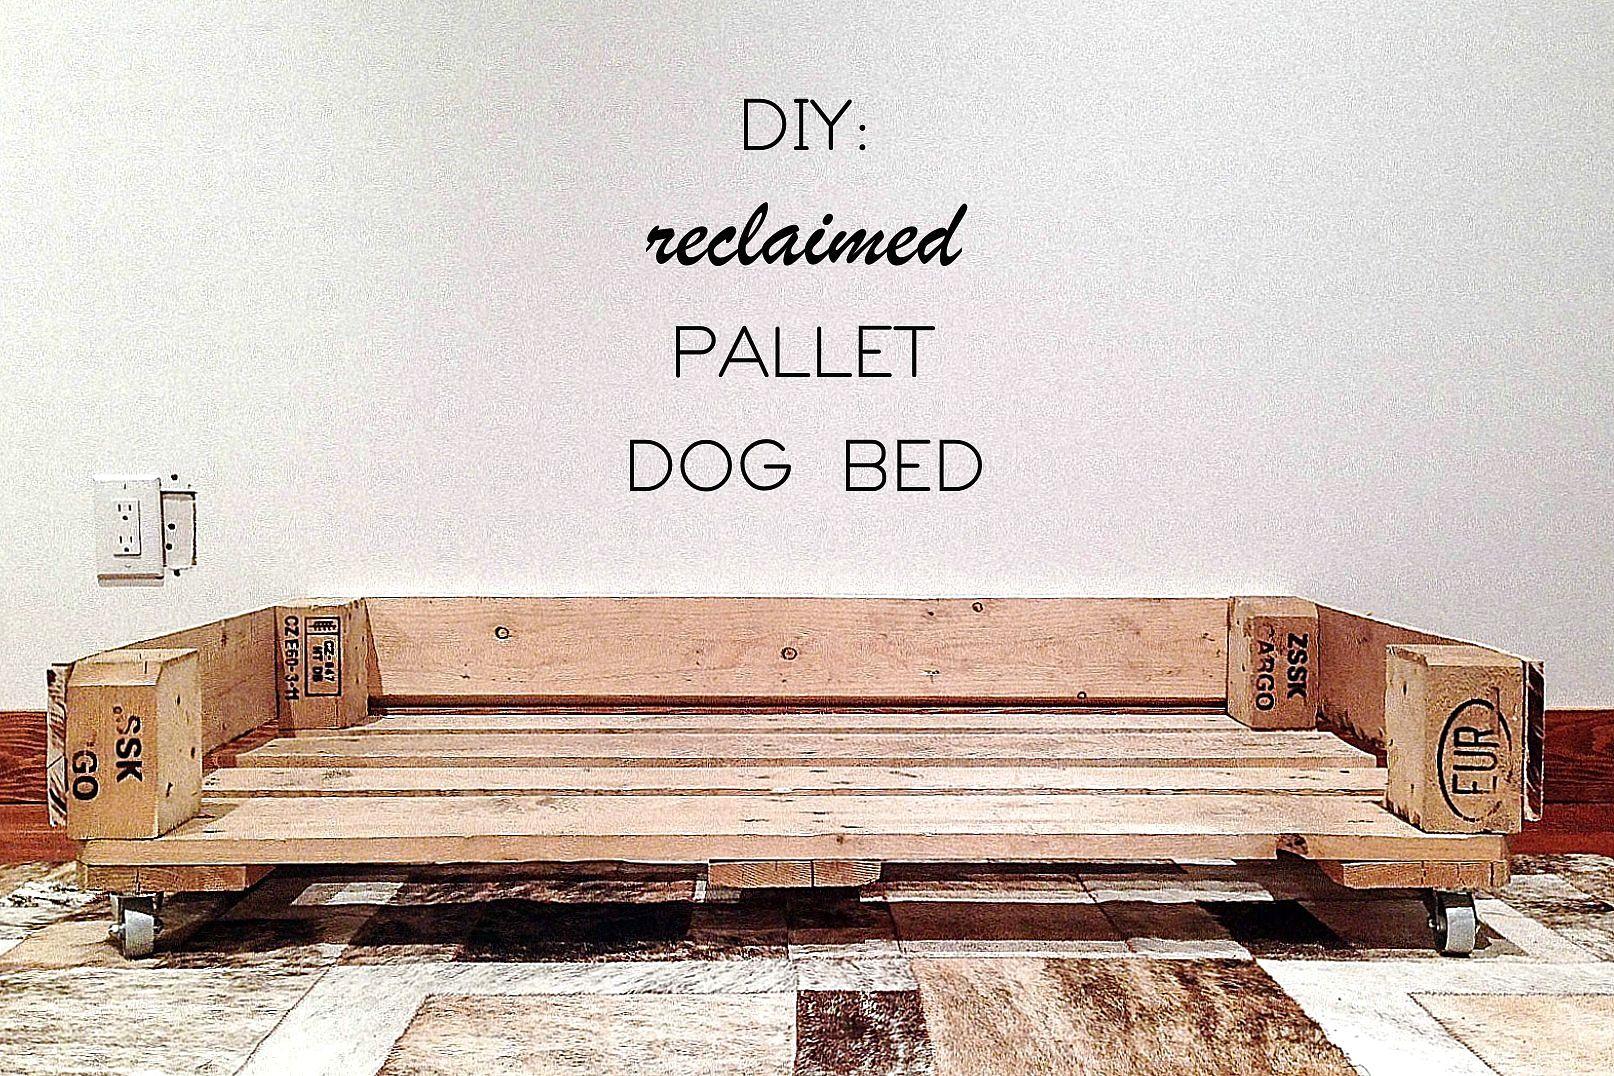 Reclaimed Wood Pallet Dog Bed Tutorial DIY Hello, DIYs